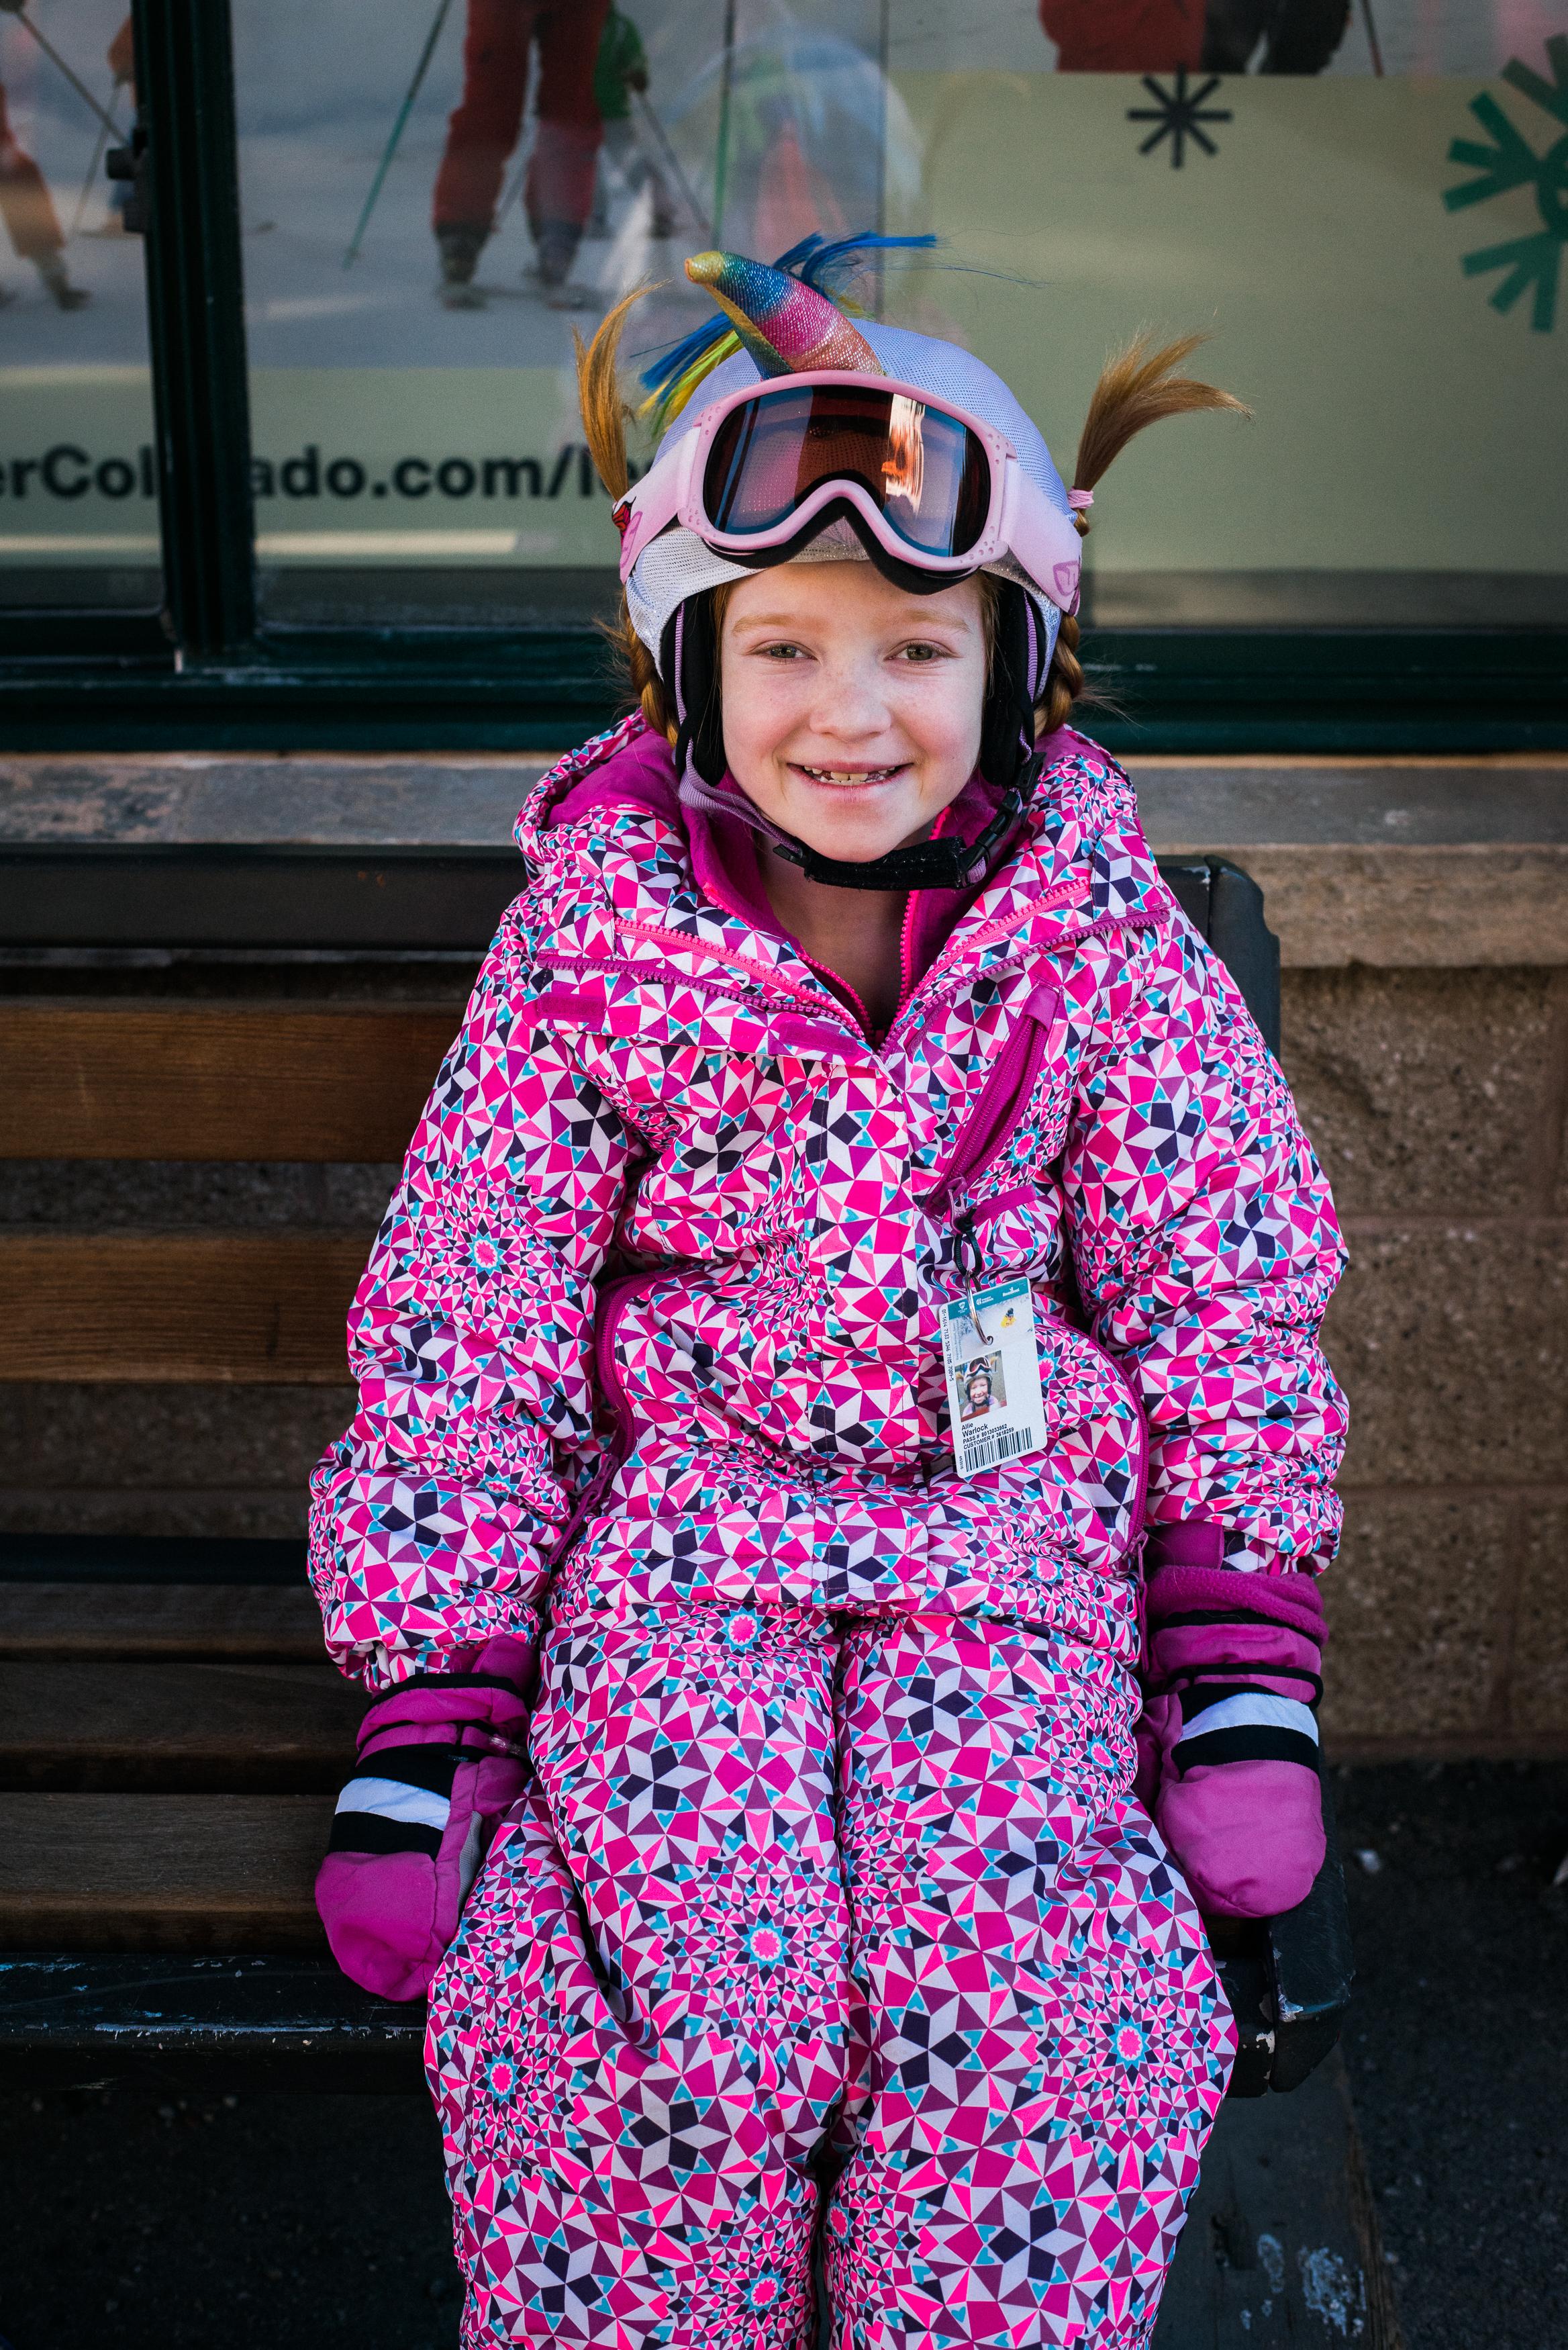 TaraShupe_Outdoor_Photographer_Loweprobags_Colorado_Copper_Mountains_Ski_32.jpg